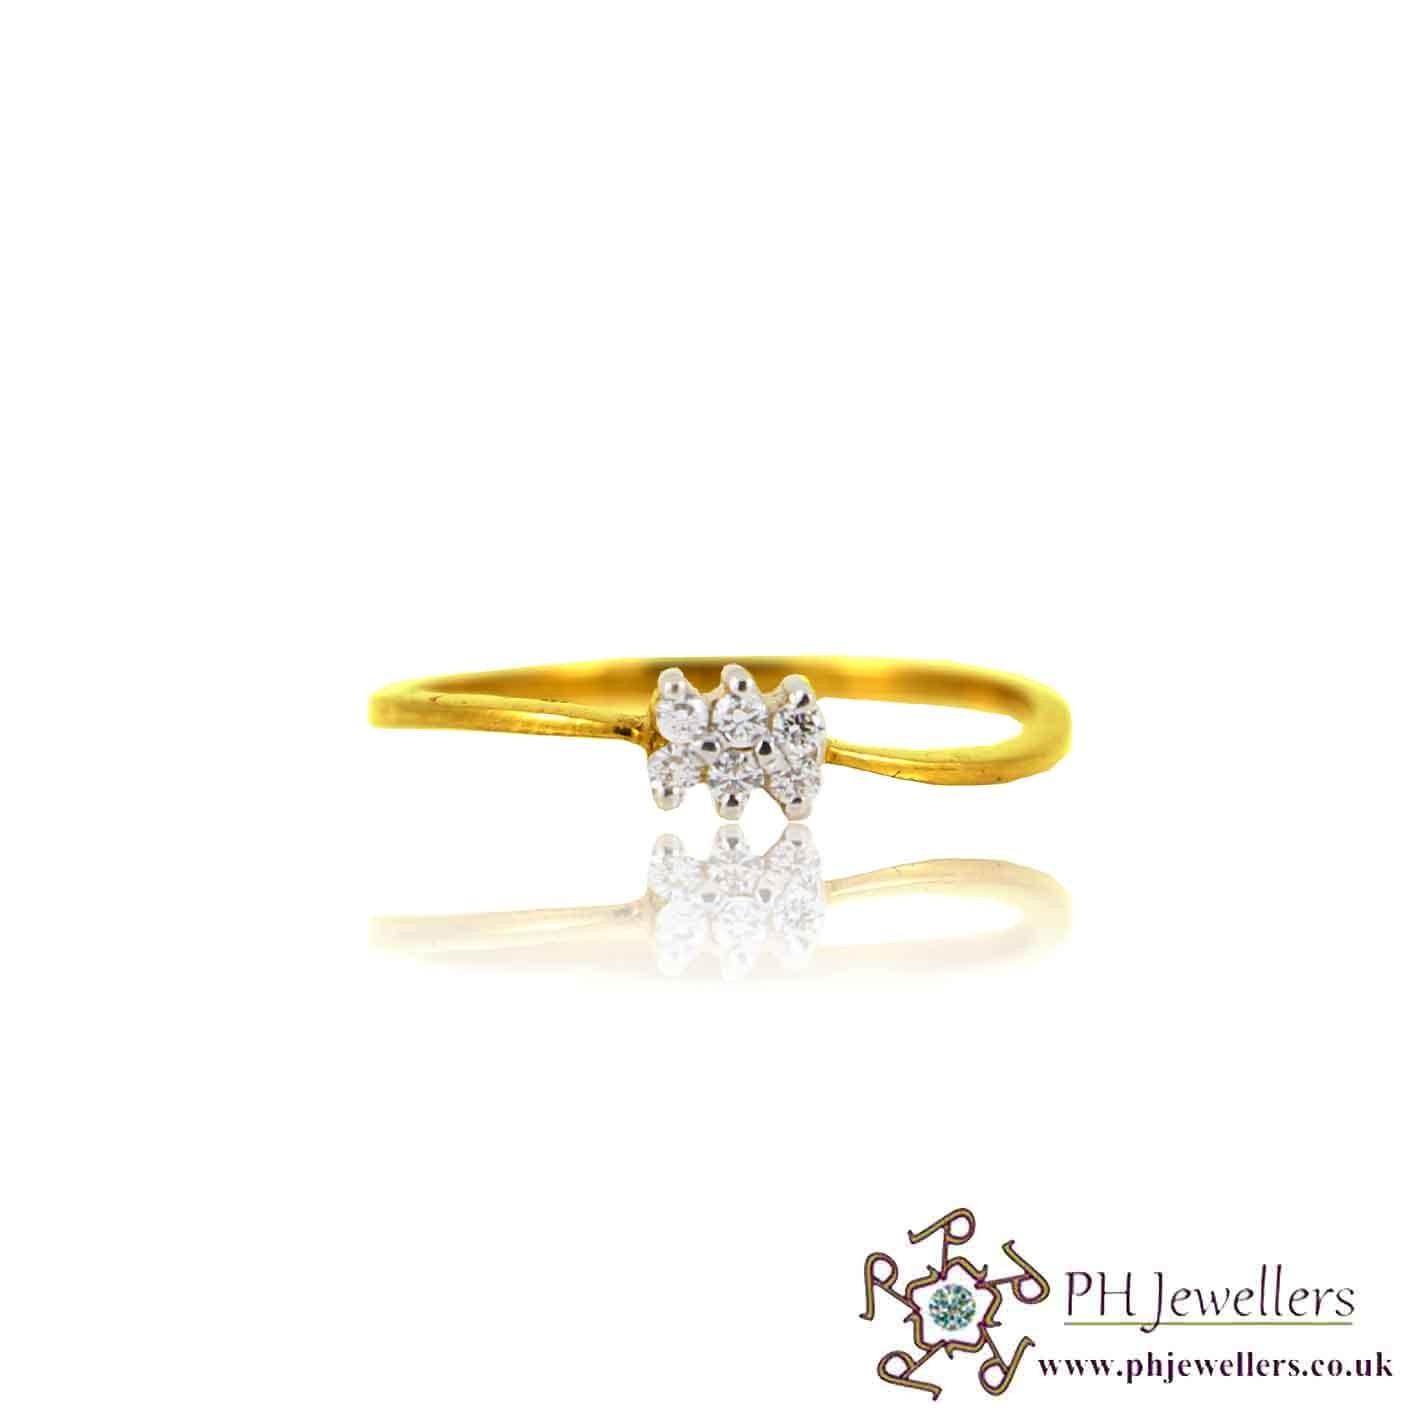 22ct 916 Yellow Gold Hallmark Ring CZ Size M SR132